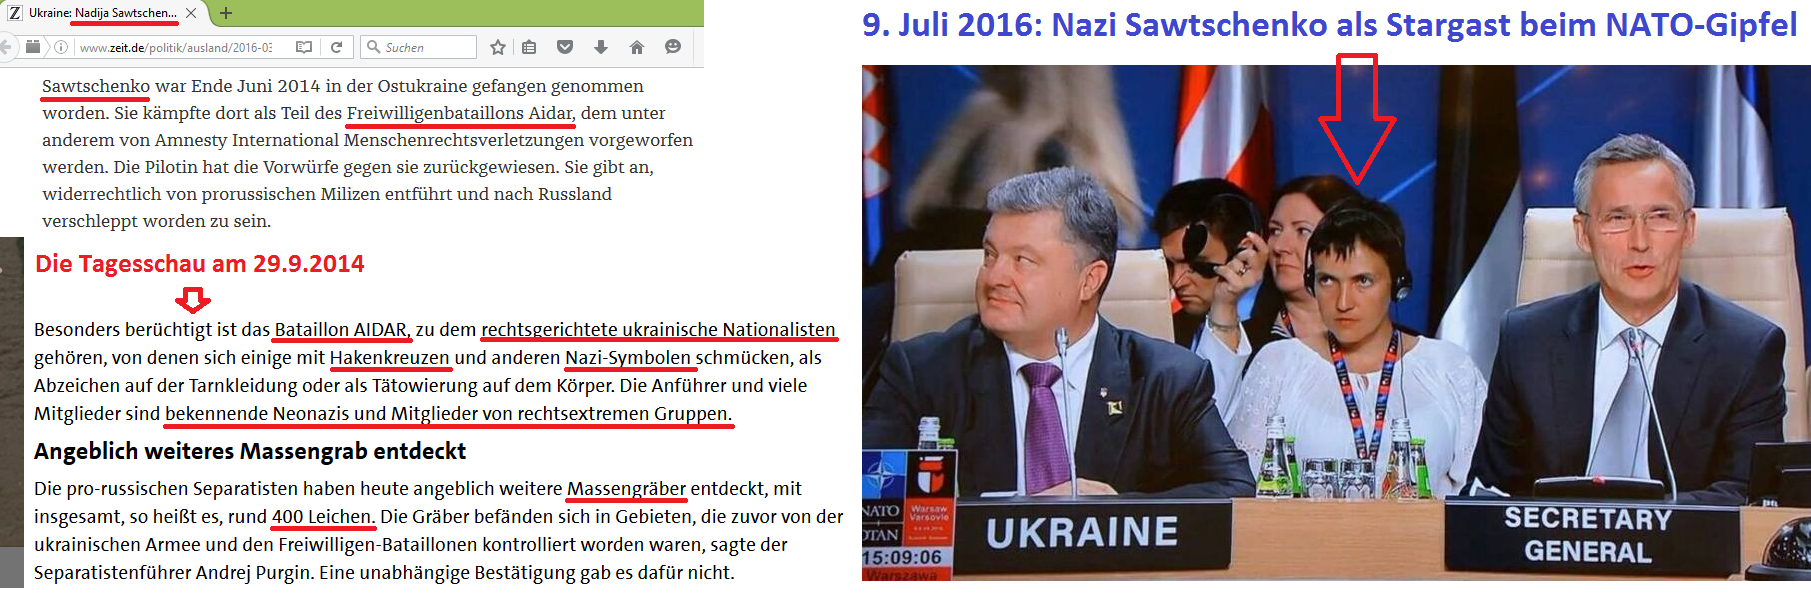 nato_nazi_text_tagesschau_zeit